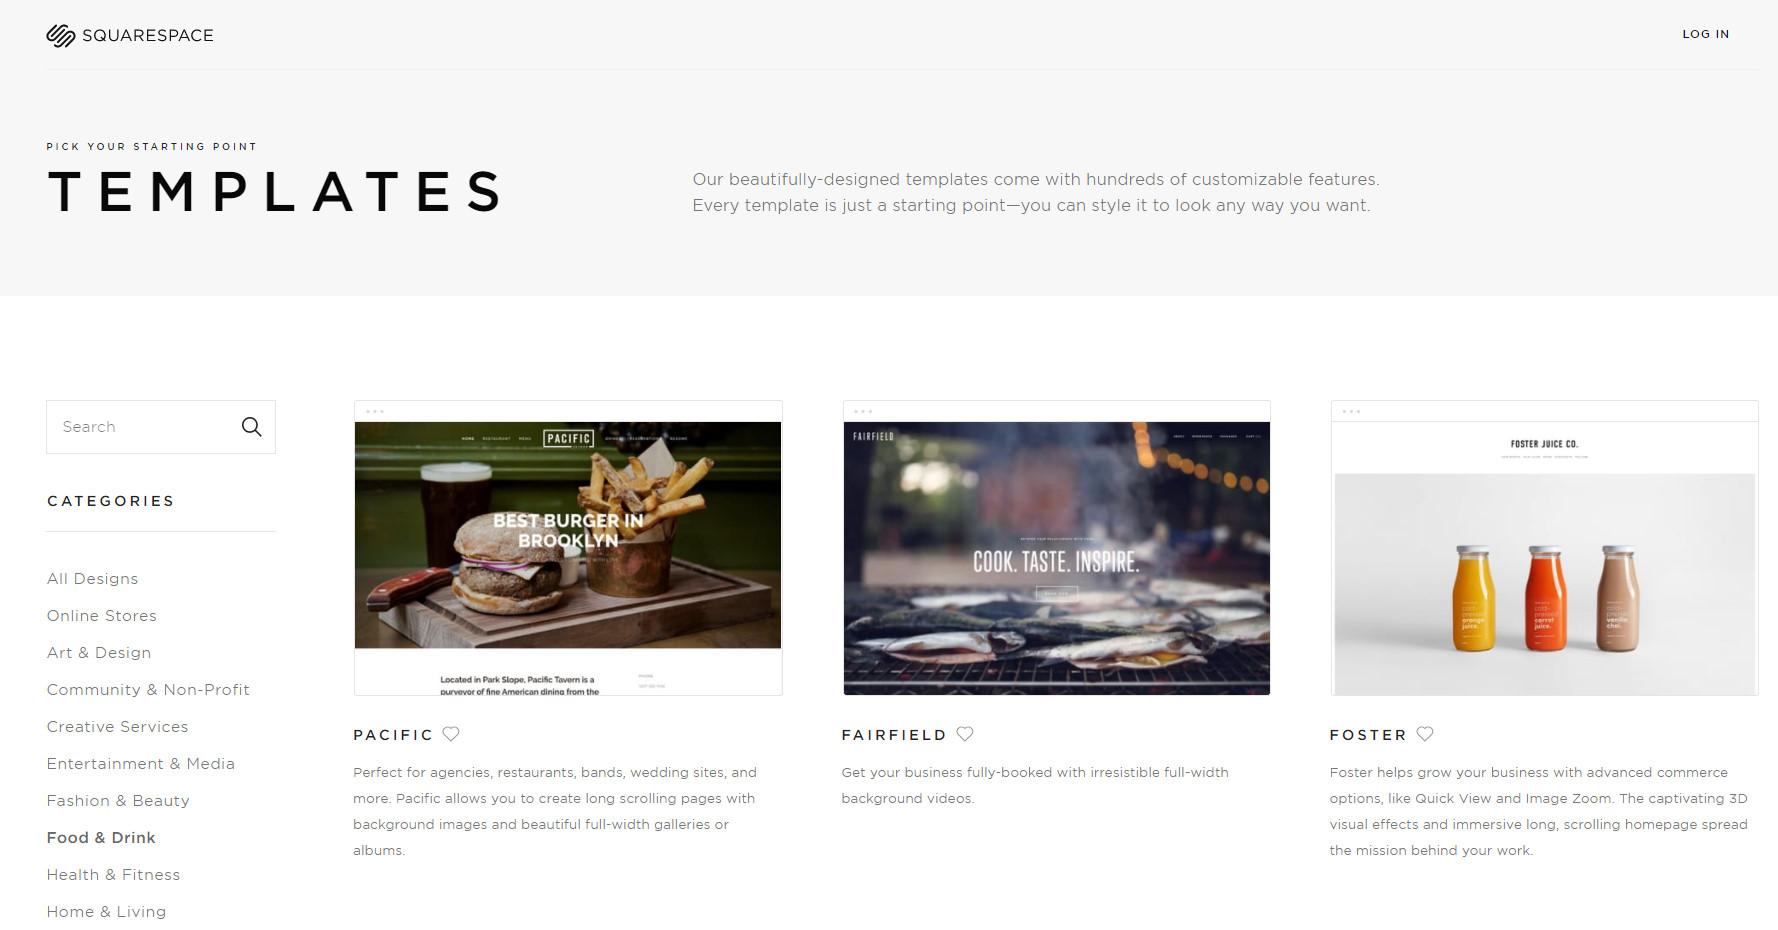 squarespace domain, squarespace blog, squarespace login, best website builders